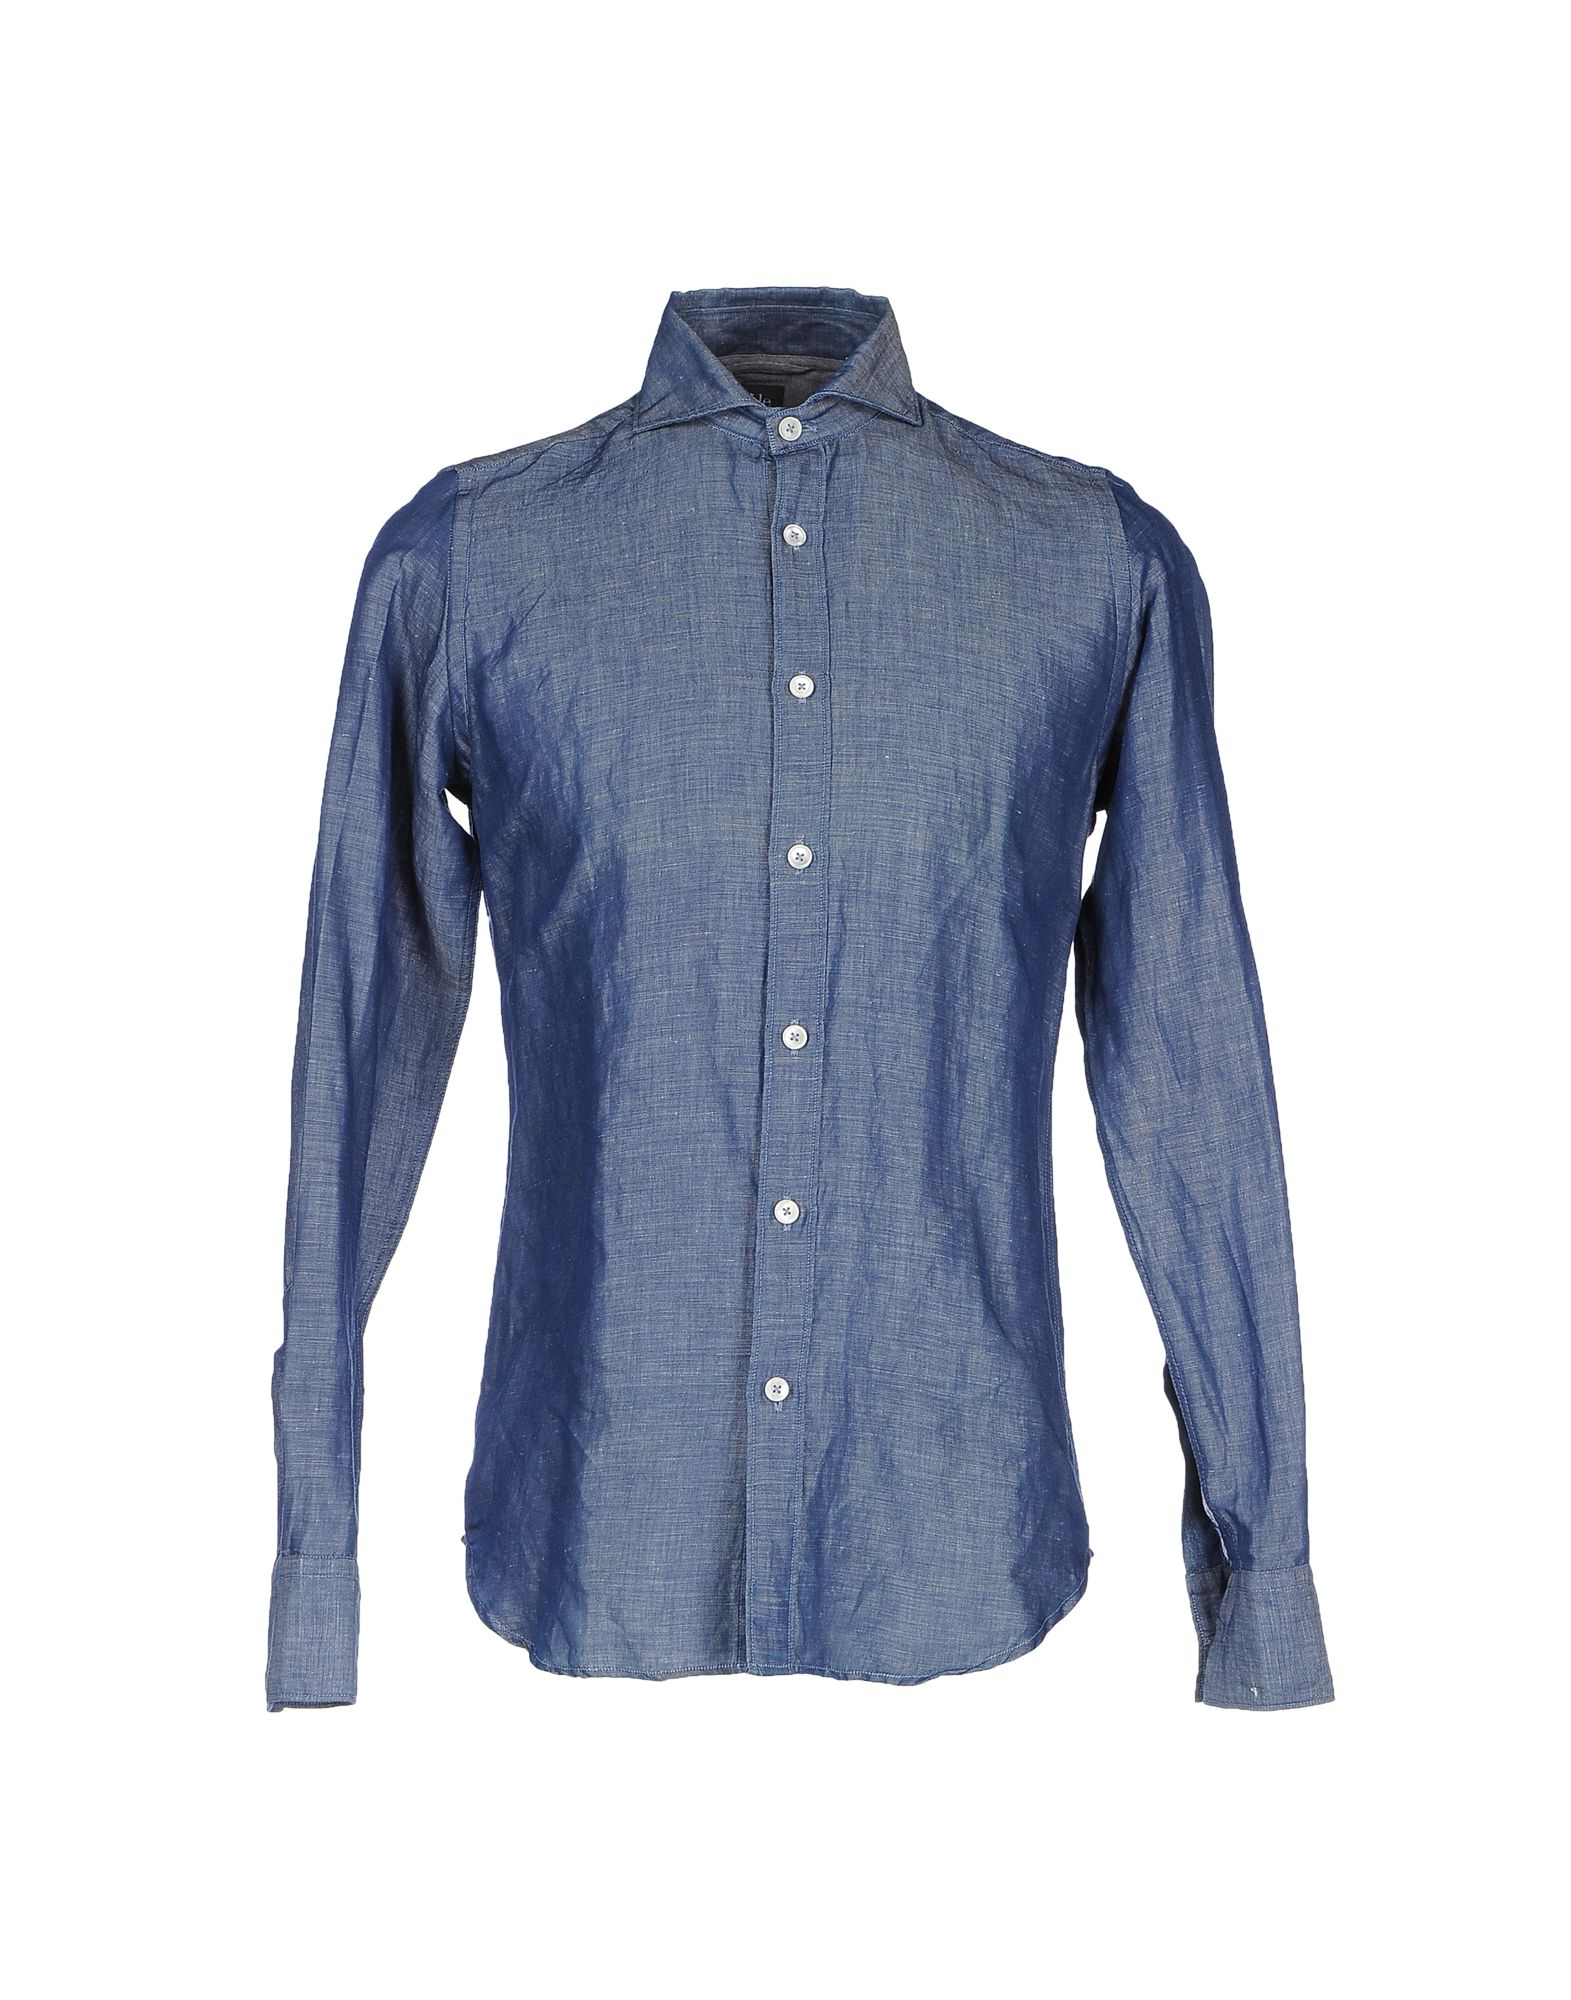 ELEVENTY Джинсовая рубашка рубашка джинсовая 3 12 лет